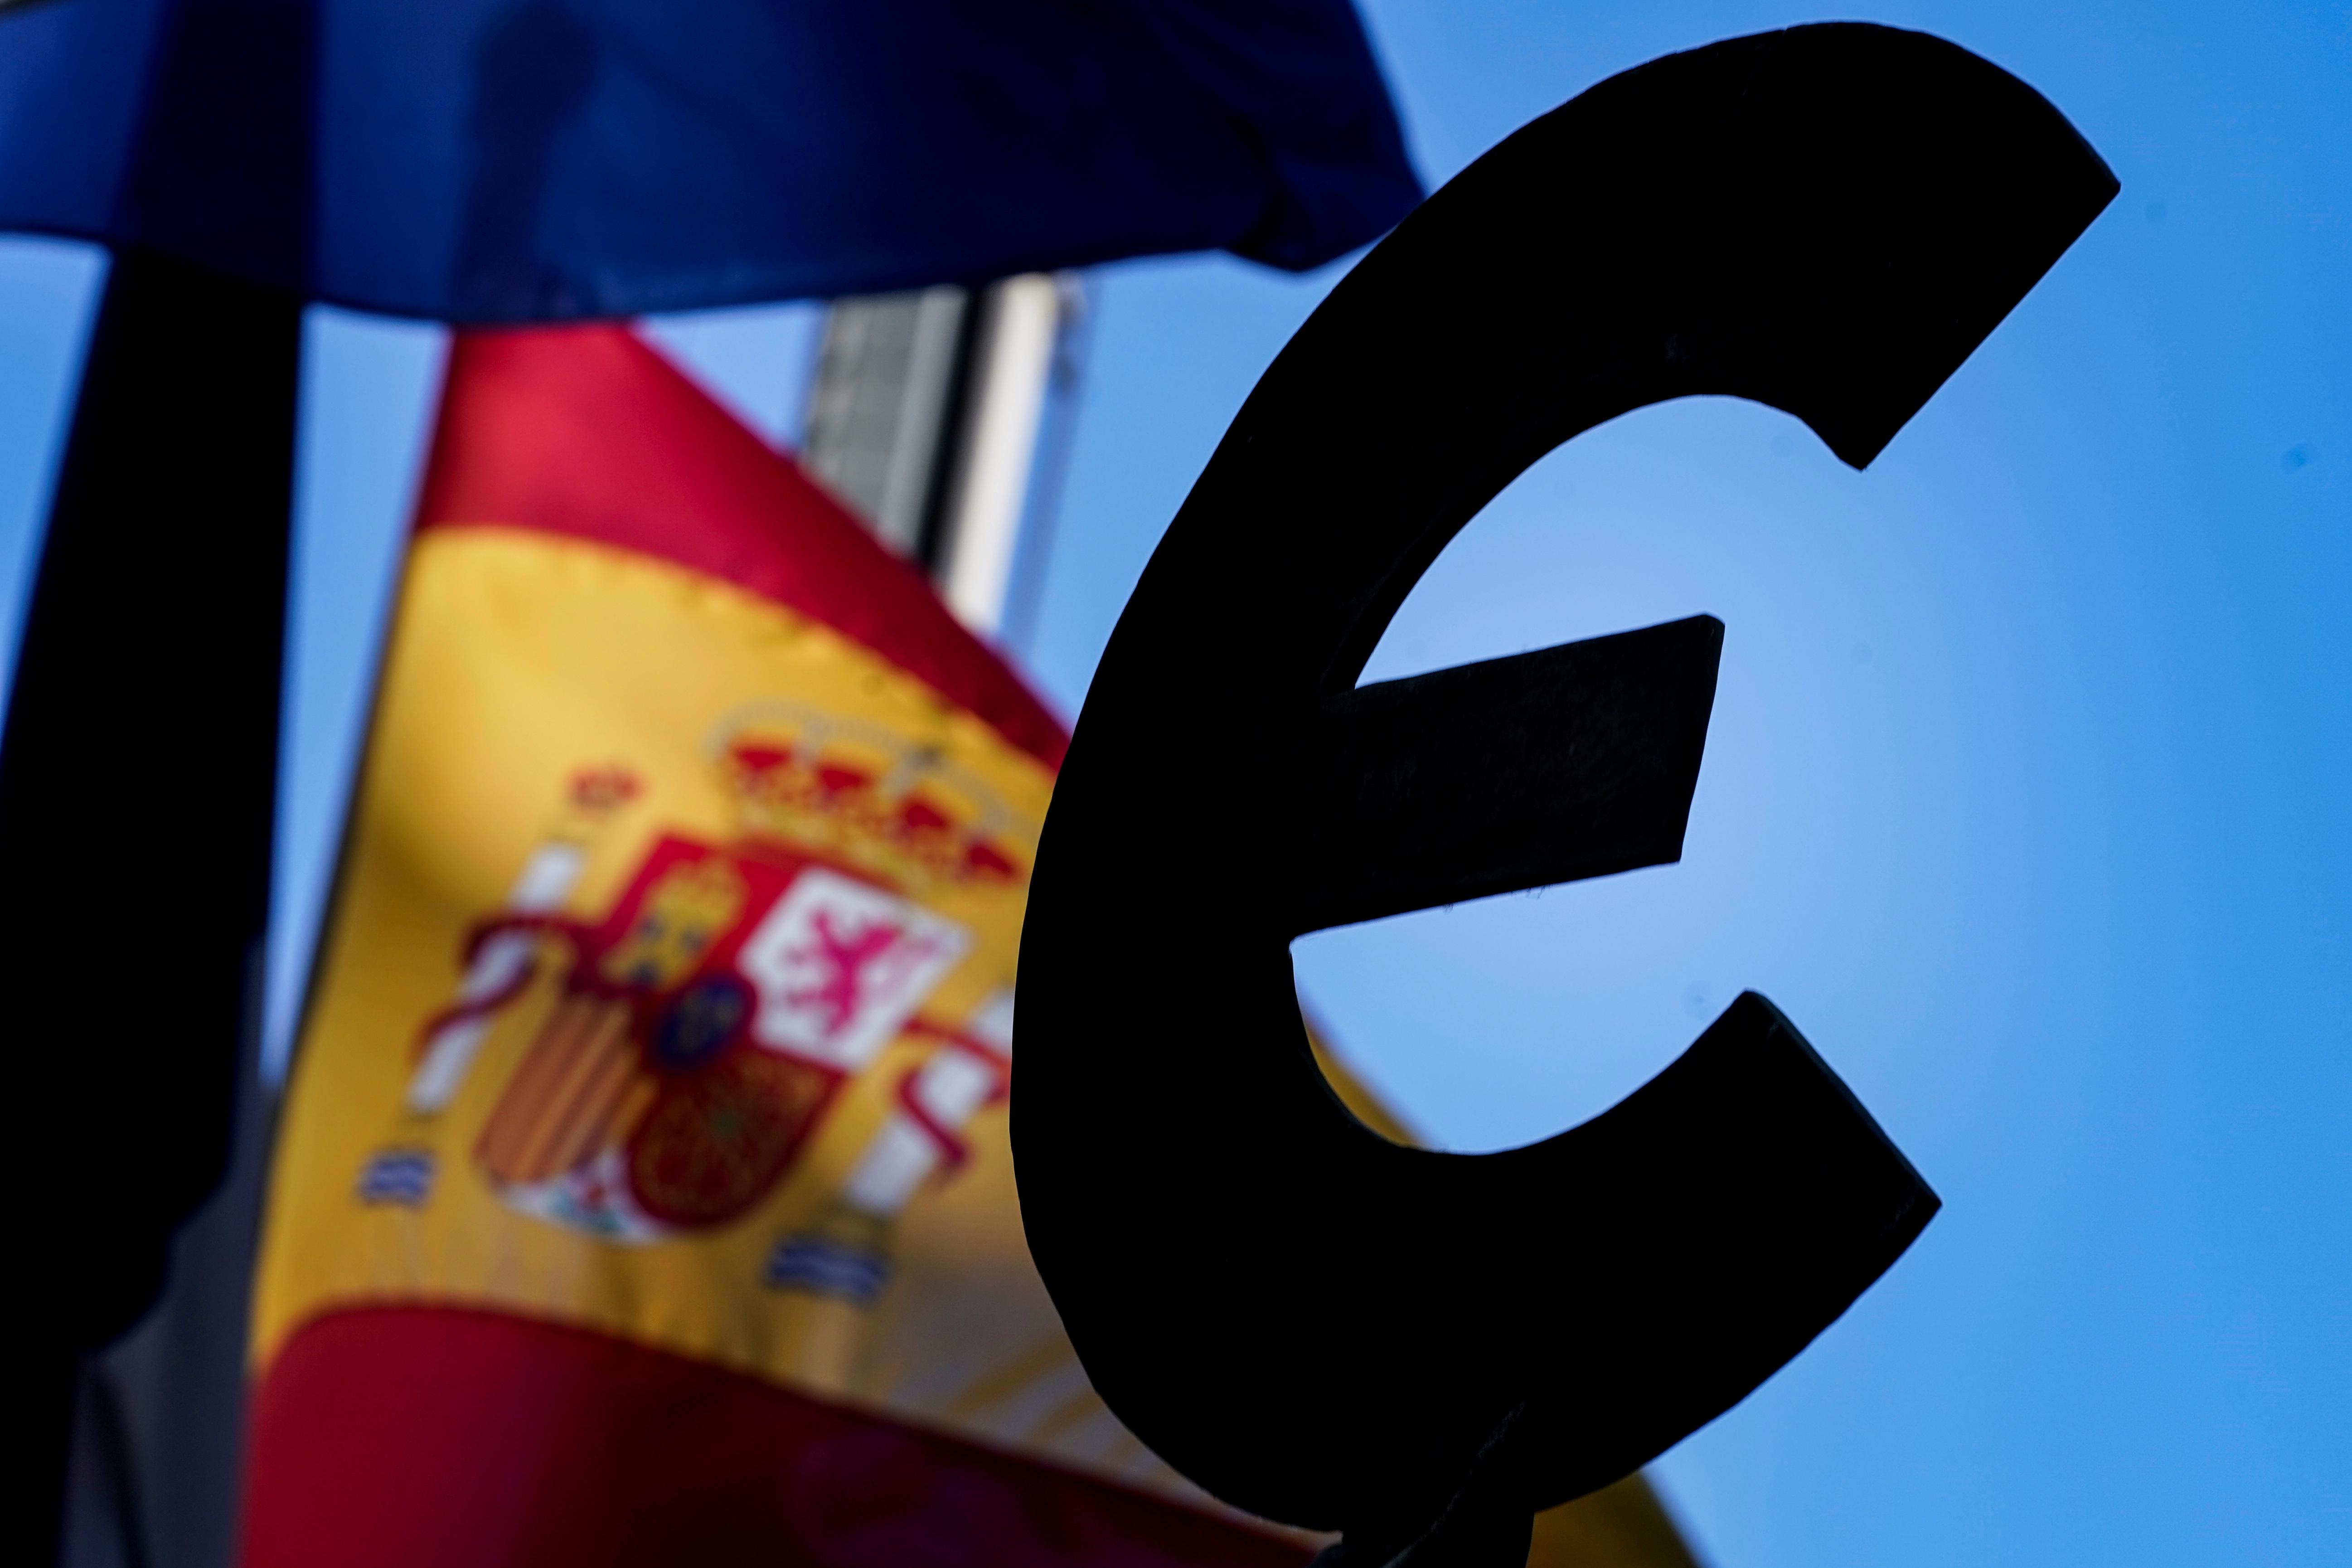 Eurozone economy shrank less than expected in 2020